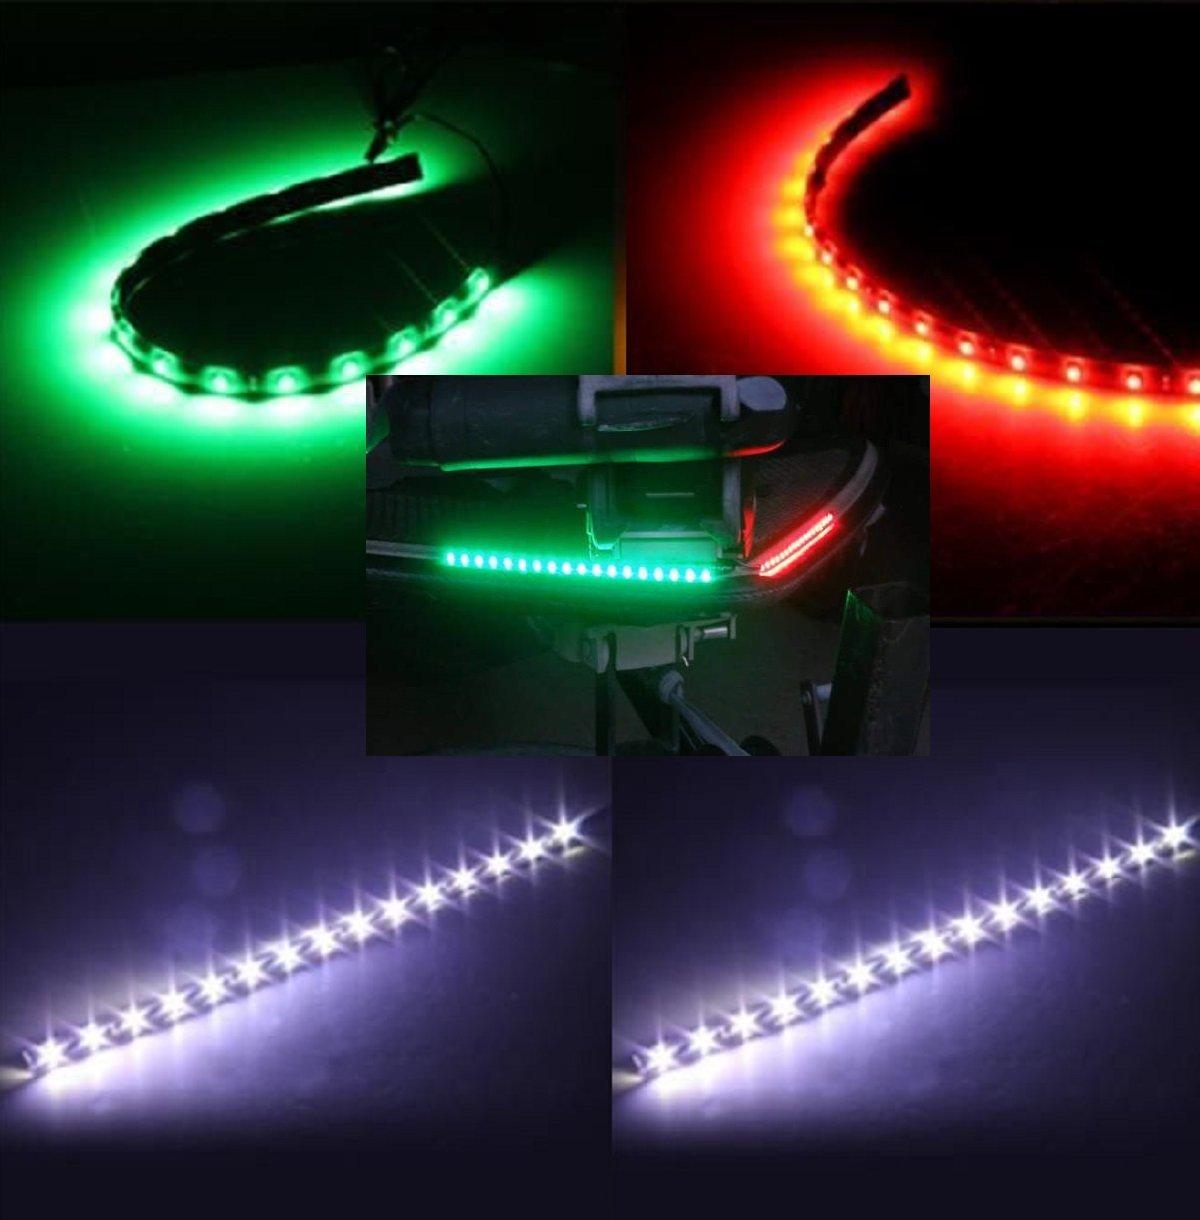 Boat Bow LED Navigation (STERN & BOW) Light Kit, Red, Green, and White Strips for Bass boats, Pontoon, Ski, Canoes, Kayaks, Triton, Ranger, BassCat, Nitro, Tracker Marine, Legend, Skeeter, Sun Tracker, Waterproof by Green Blob Outdoors